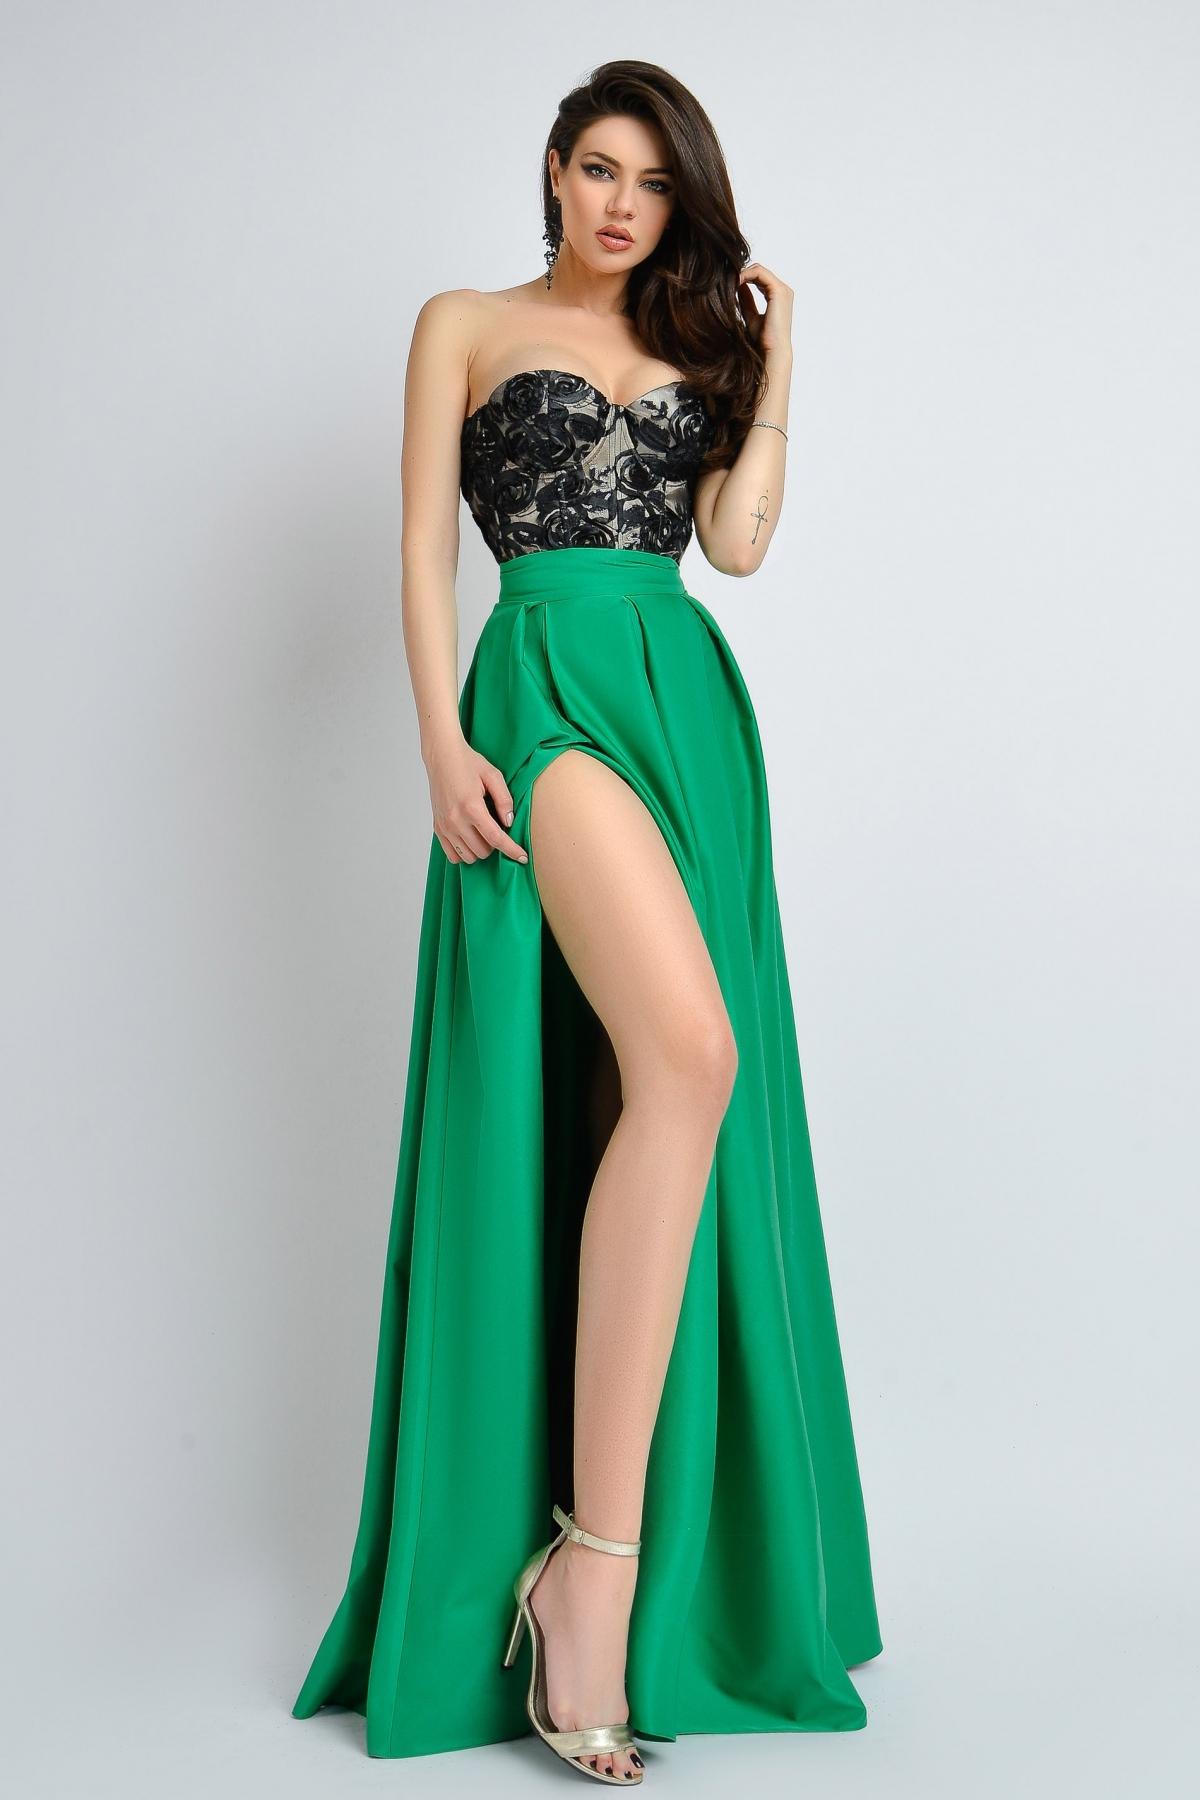 Rochie de seara verde Atmosphere cu corset negru paietat Atmosphere